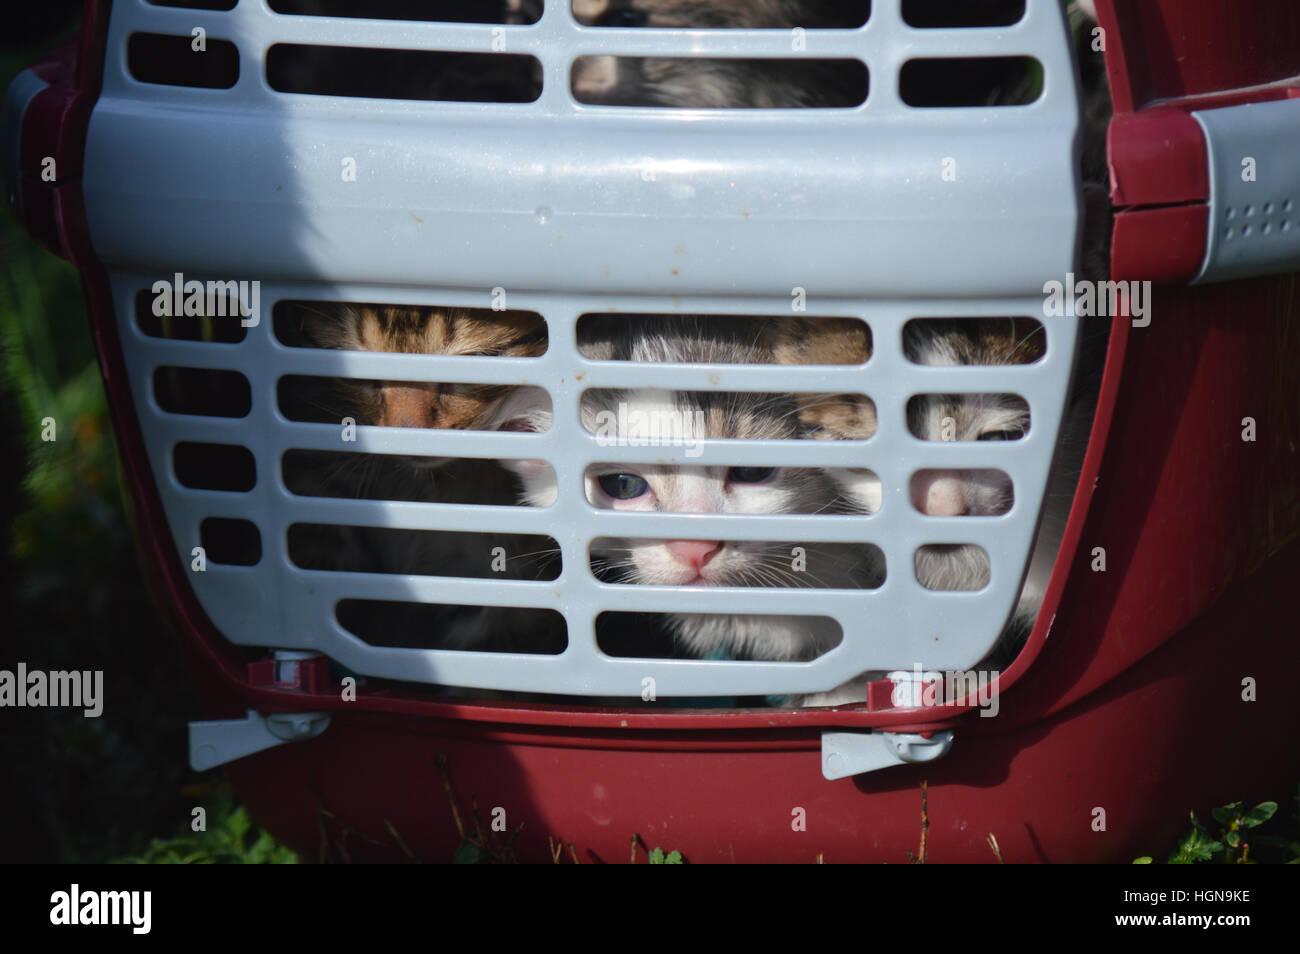 saved orphan little kittens in pet carrier shelter - Stock Image